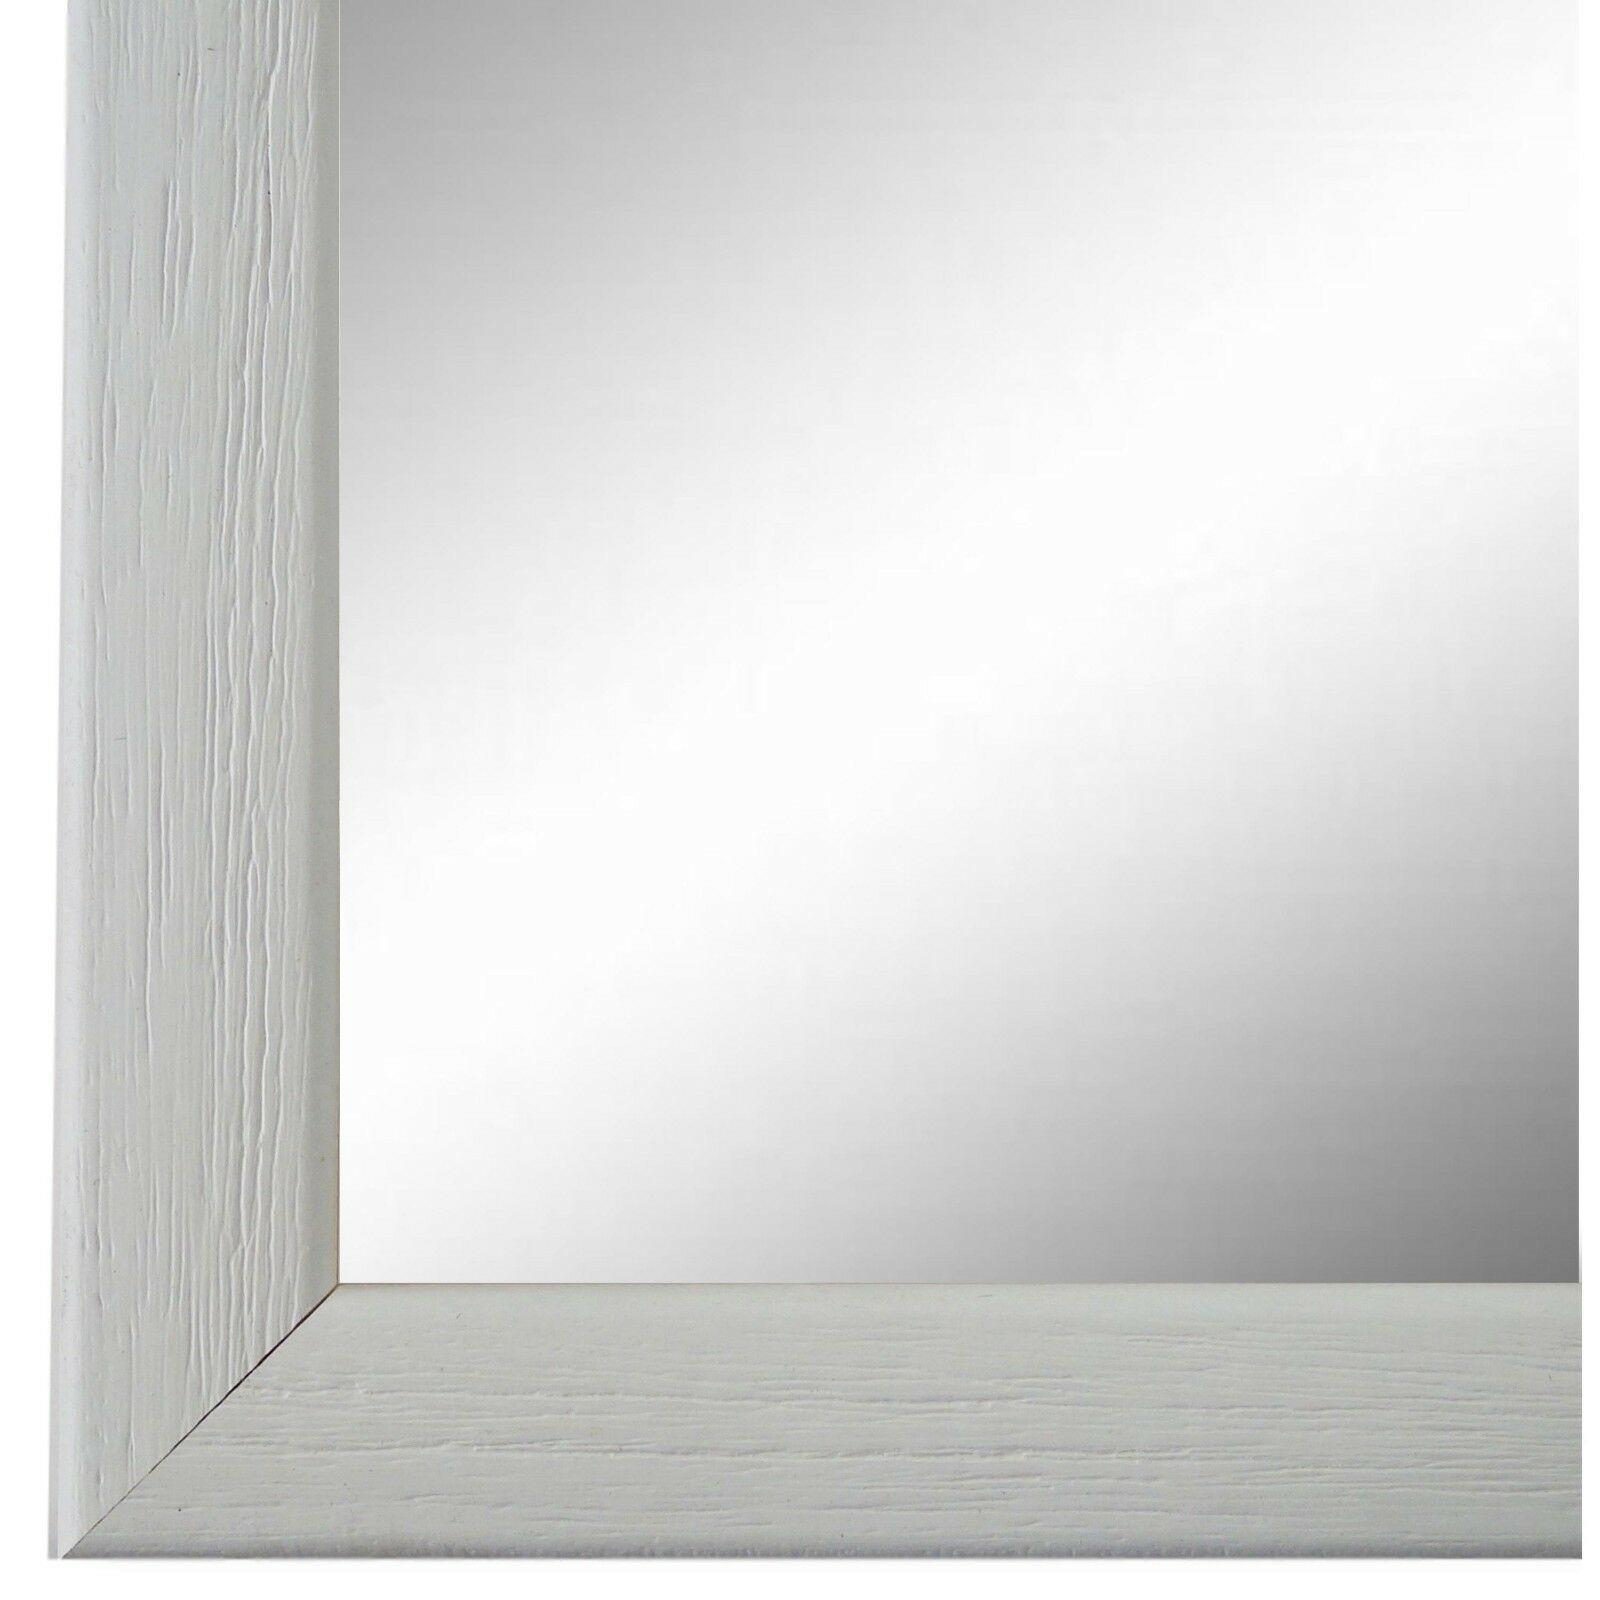 Wandspiegel Spiegel Weiss Retro Vintage Holz Pinerolo 2, 3 - NEU ...